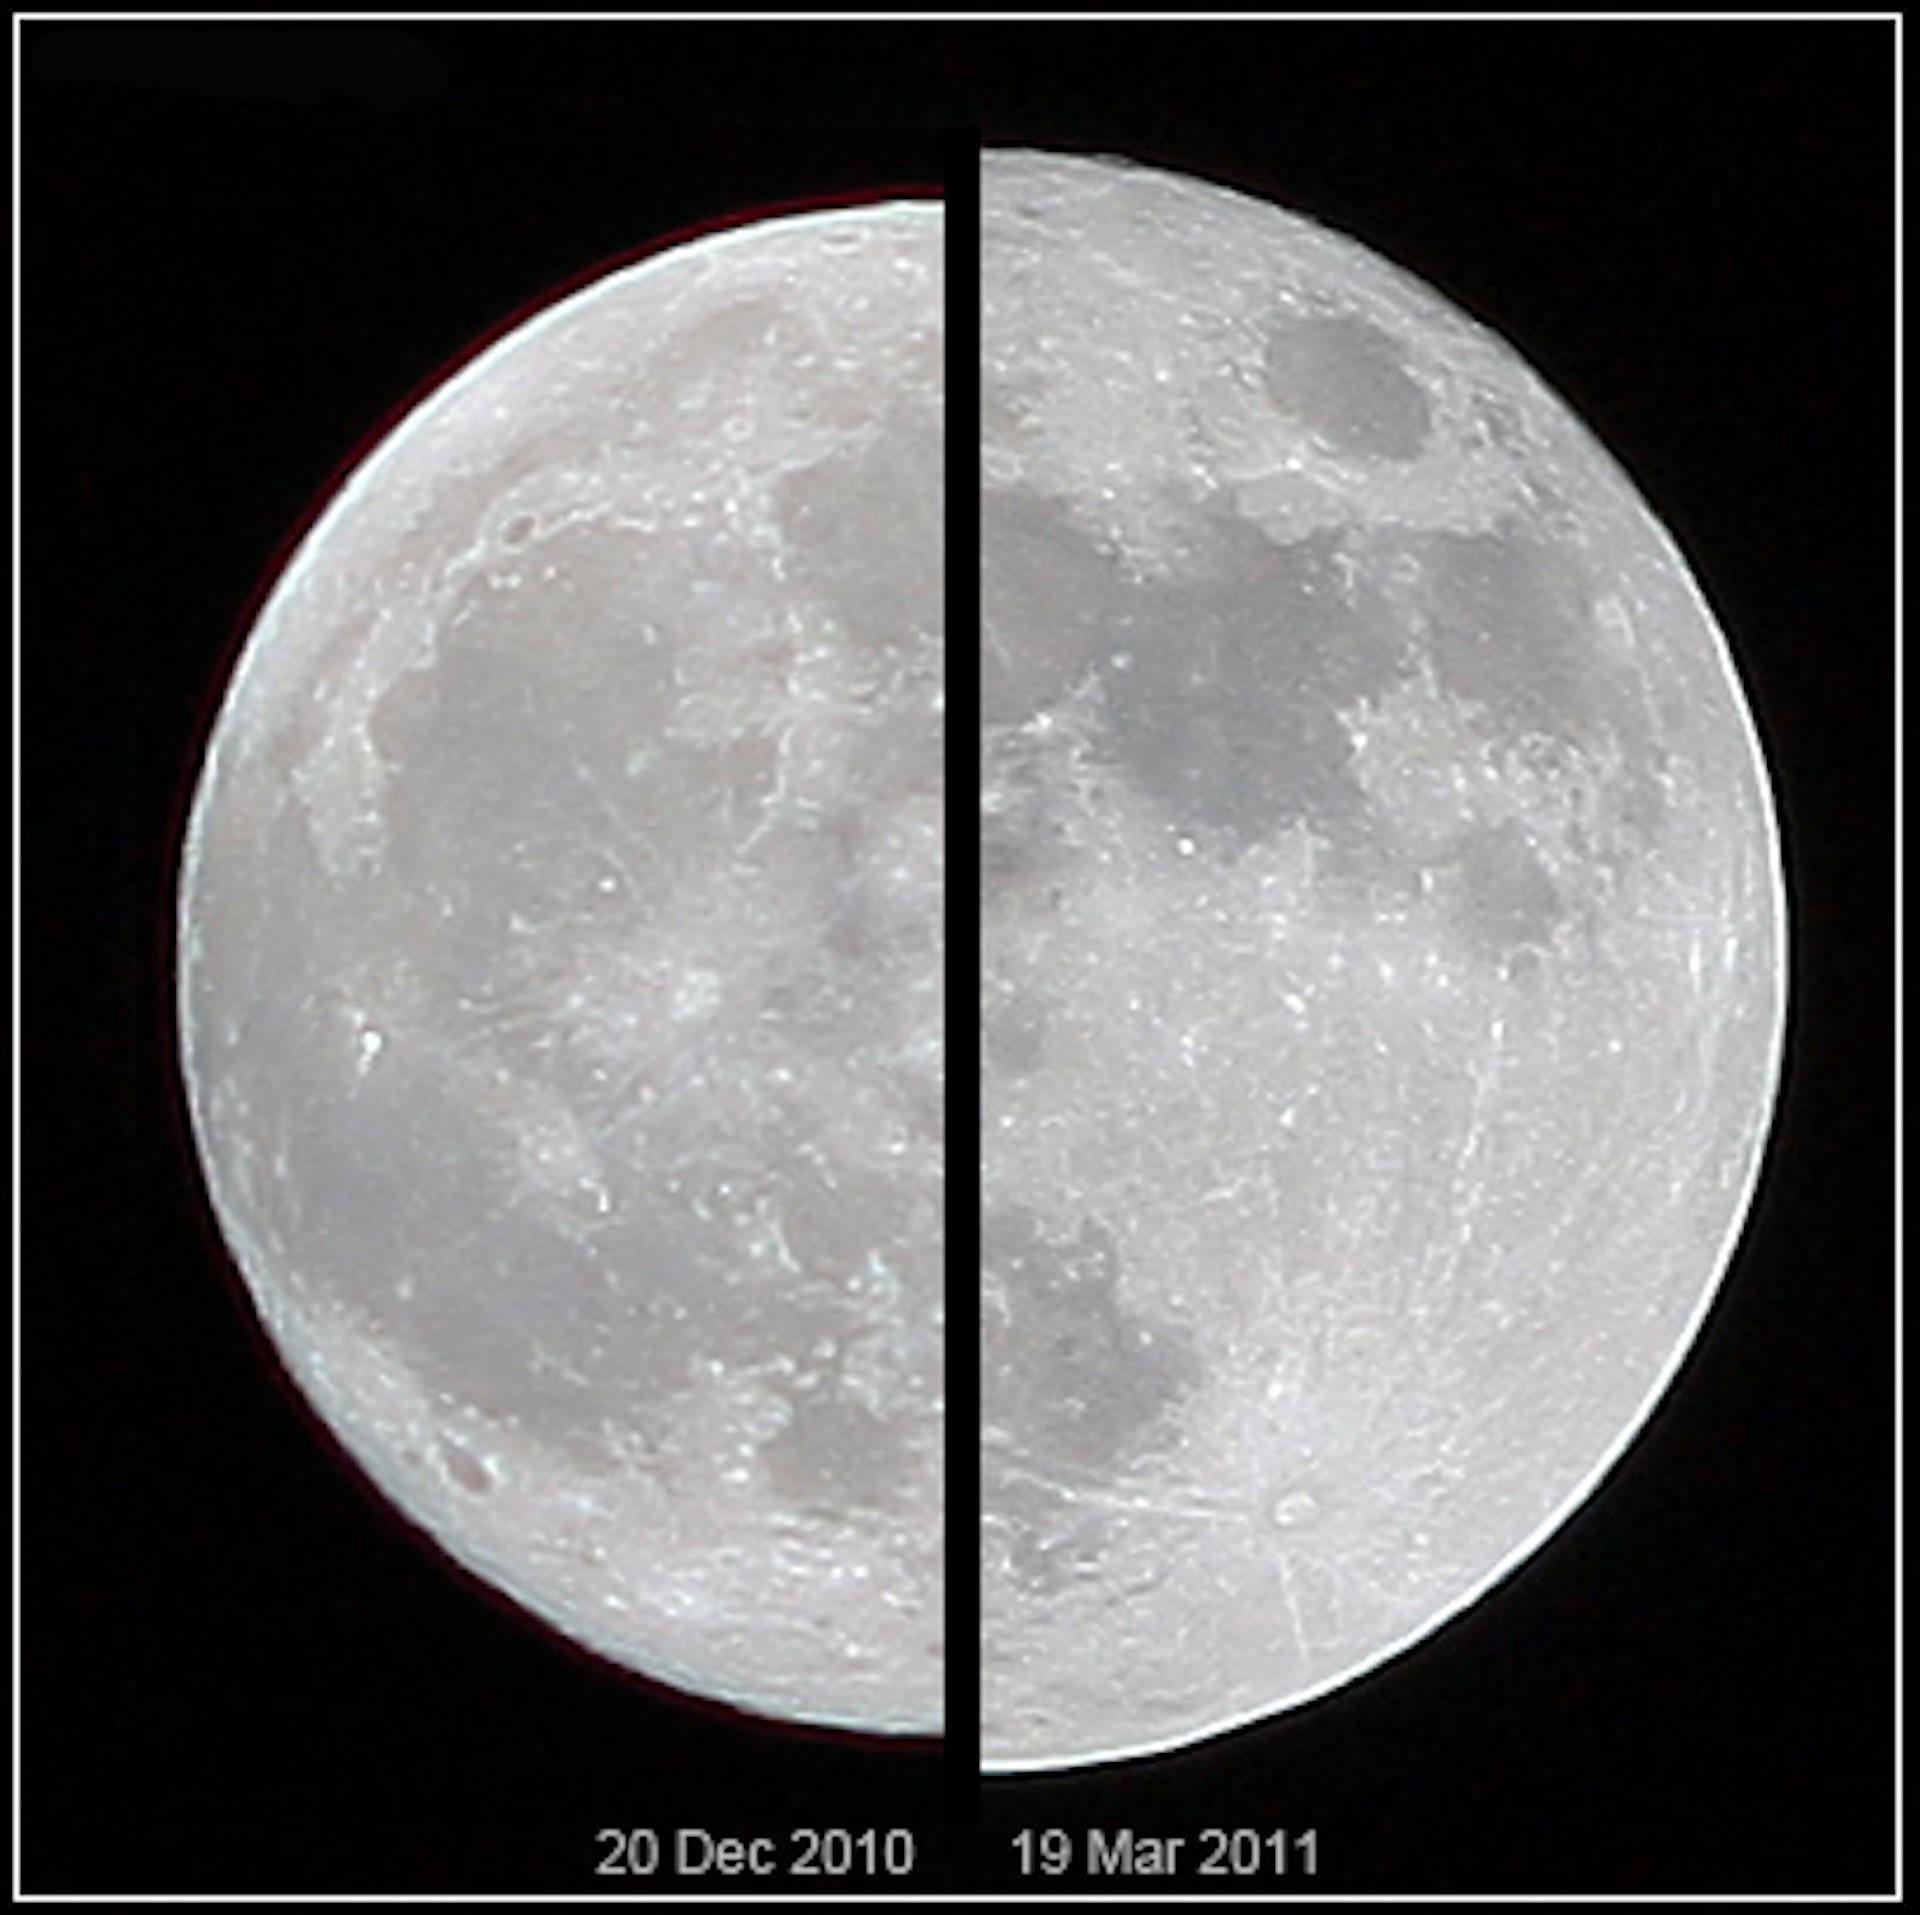 Appearance of an 'average' moon versus a supermoon. Marcoaliaslama, CC BY-SA